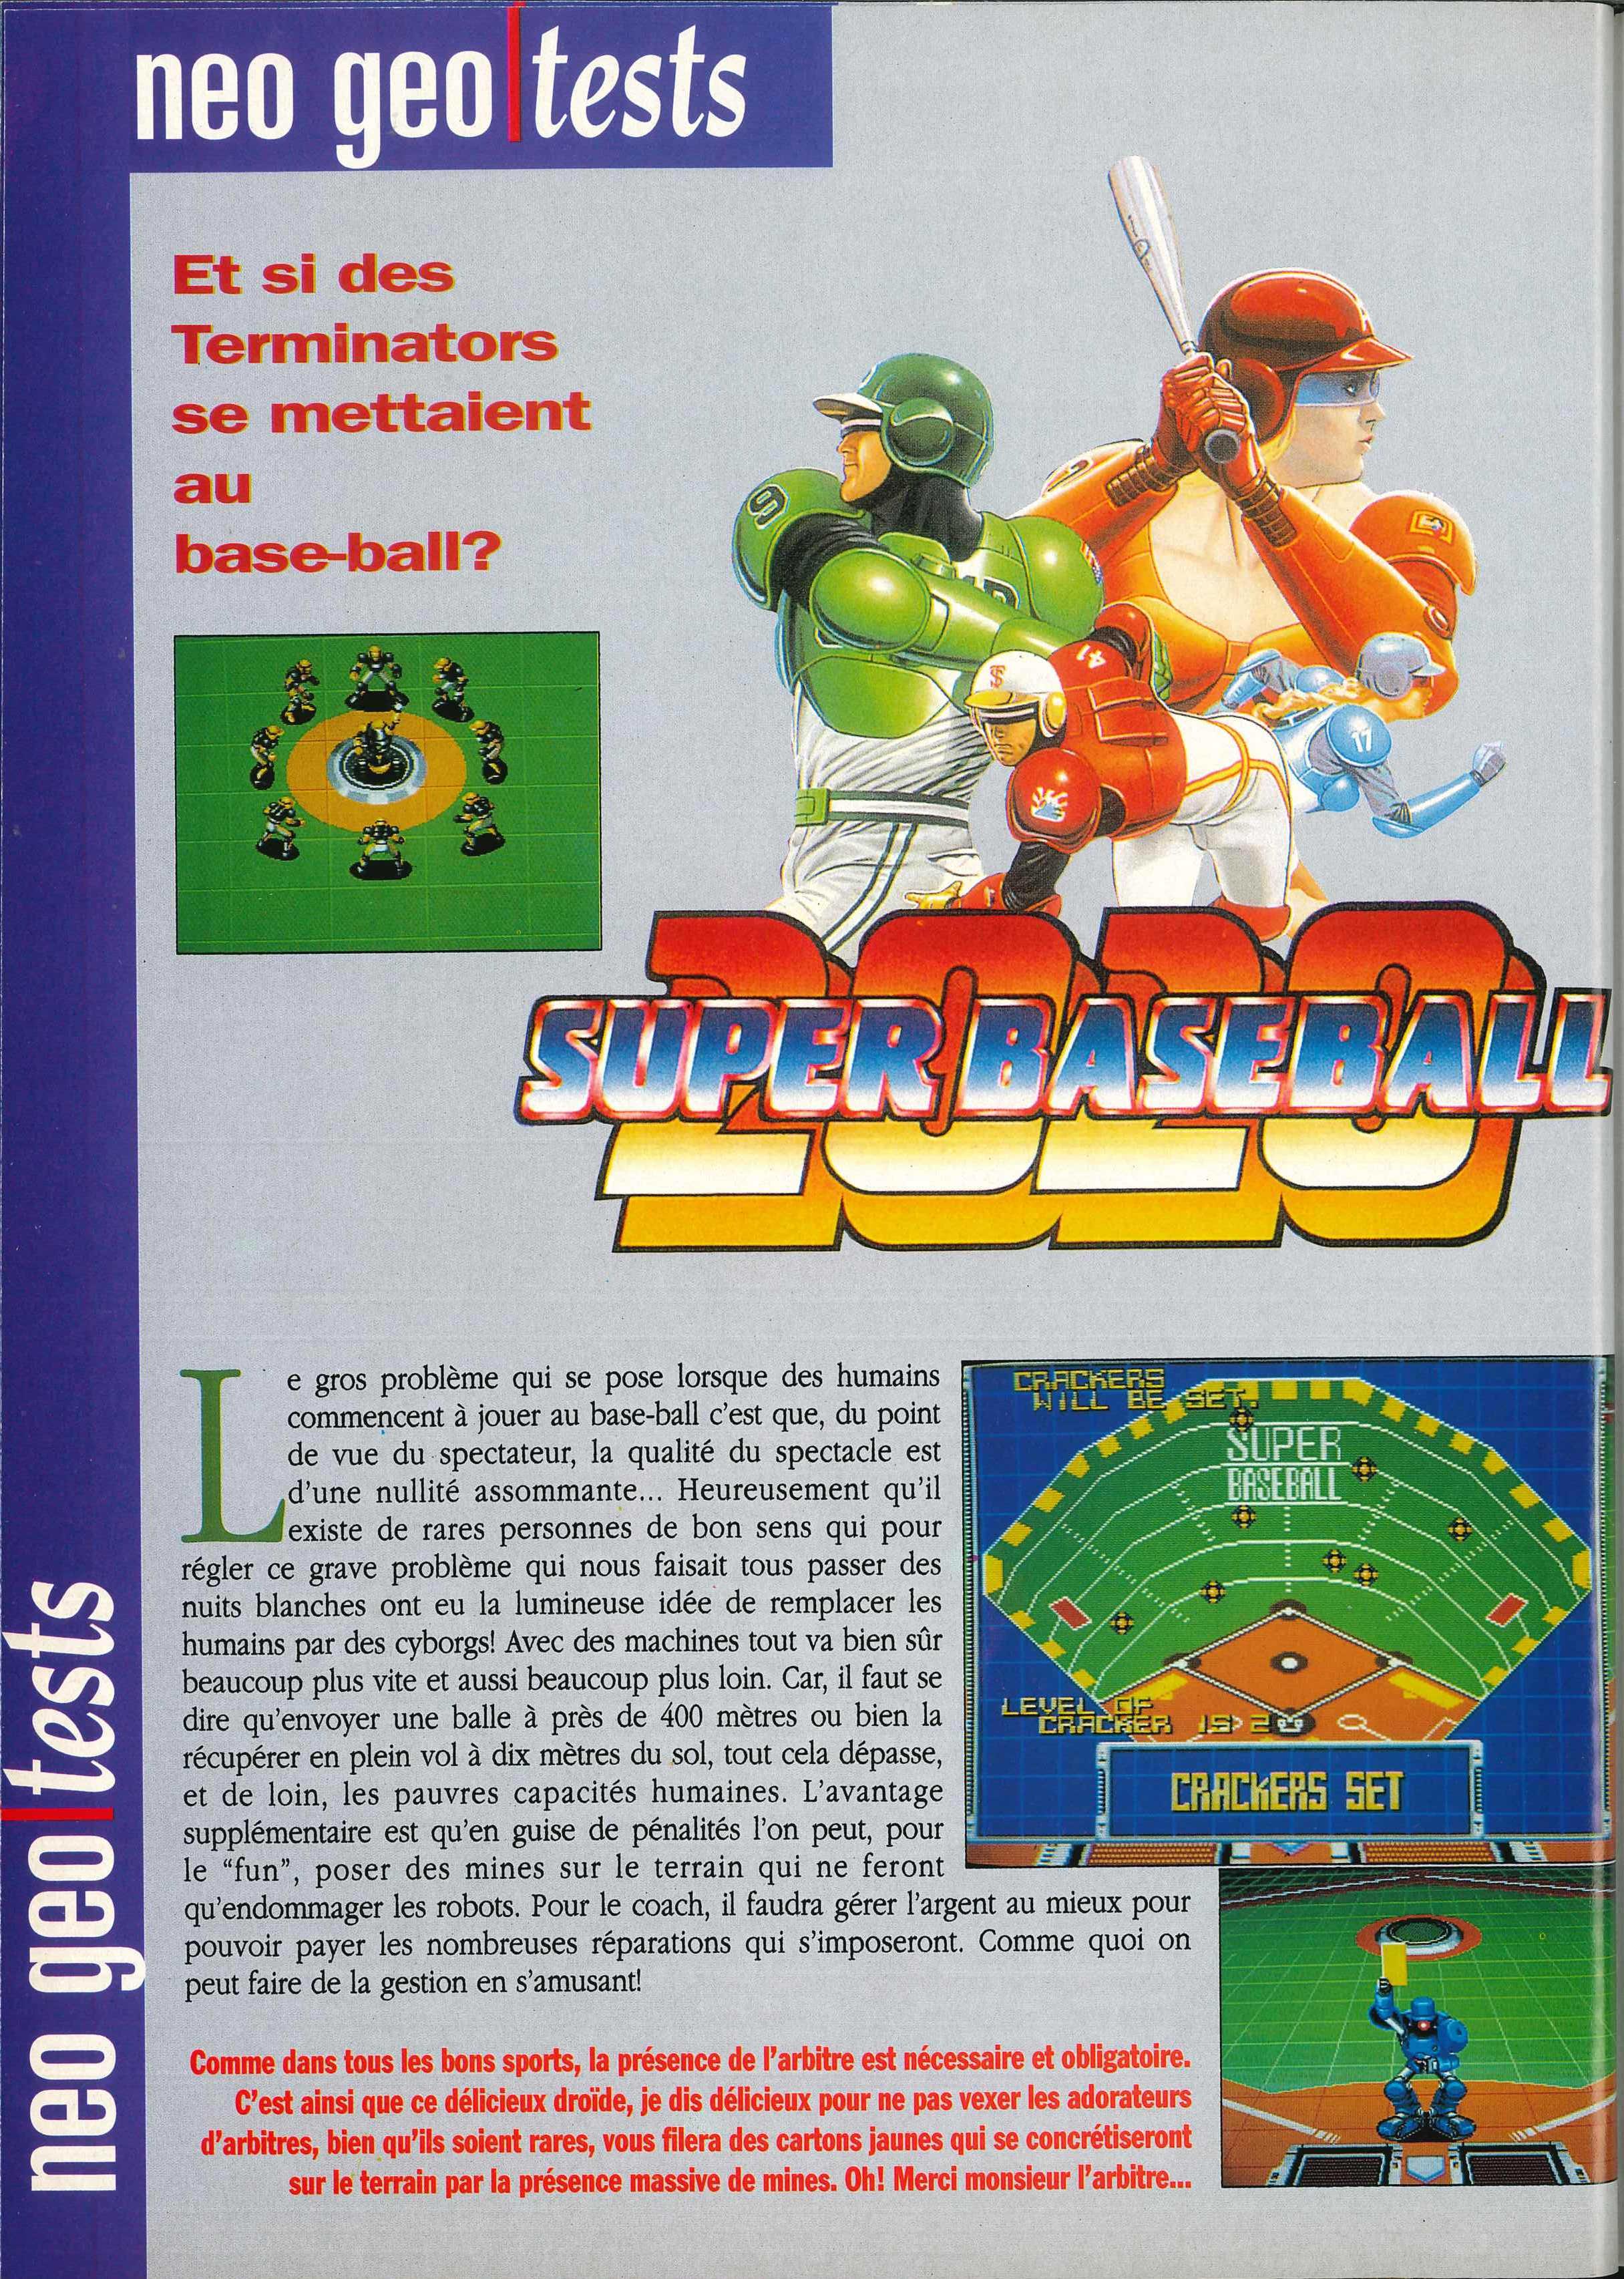 La NEO•GEO dans la presse - Volume II (1991) Joypad%20003%20-%20Page%20126%20%281991-12%29